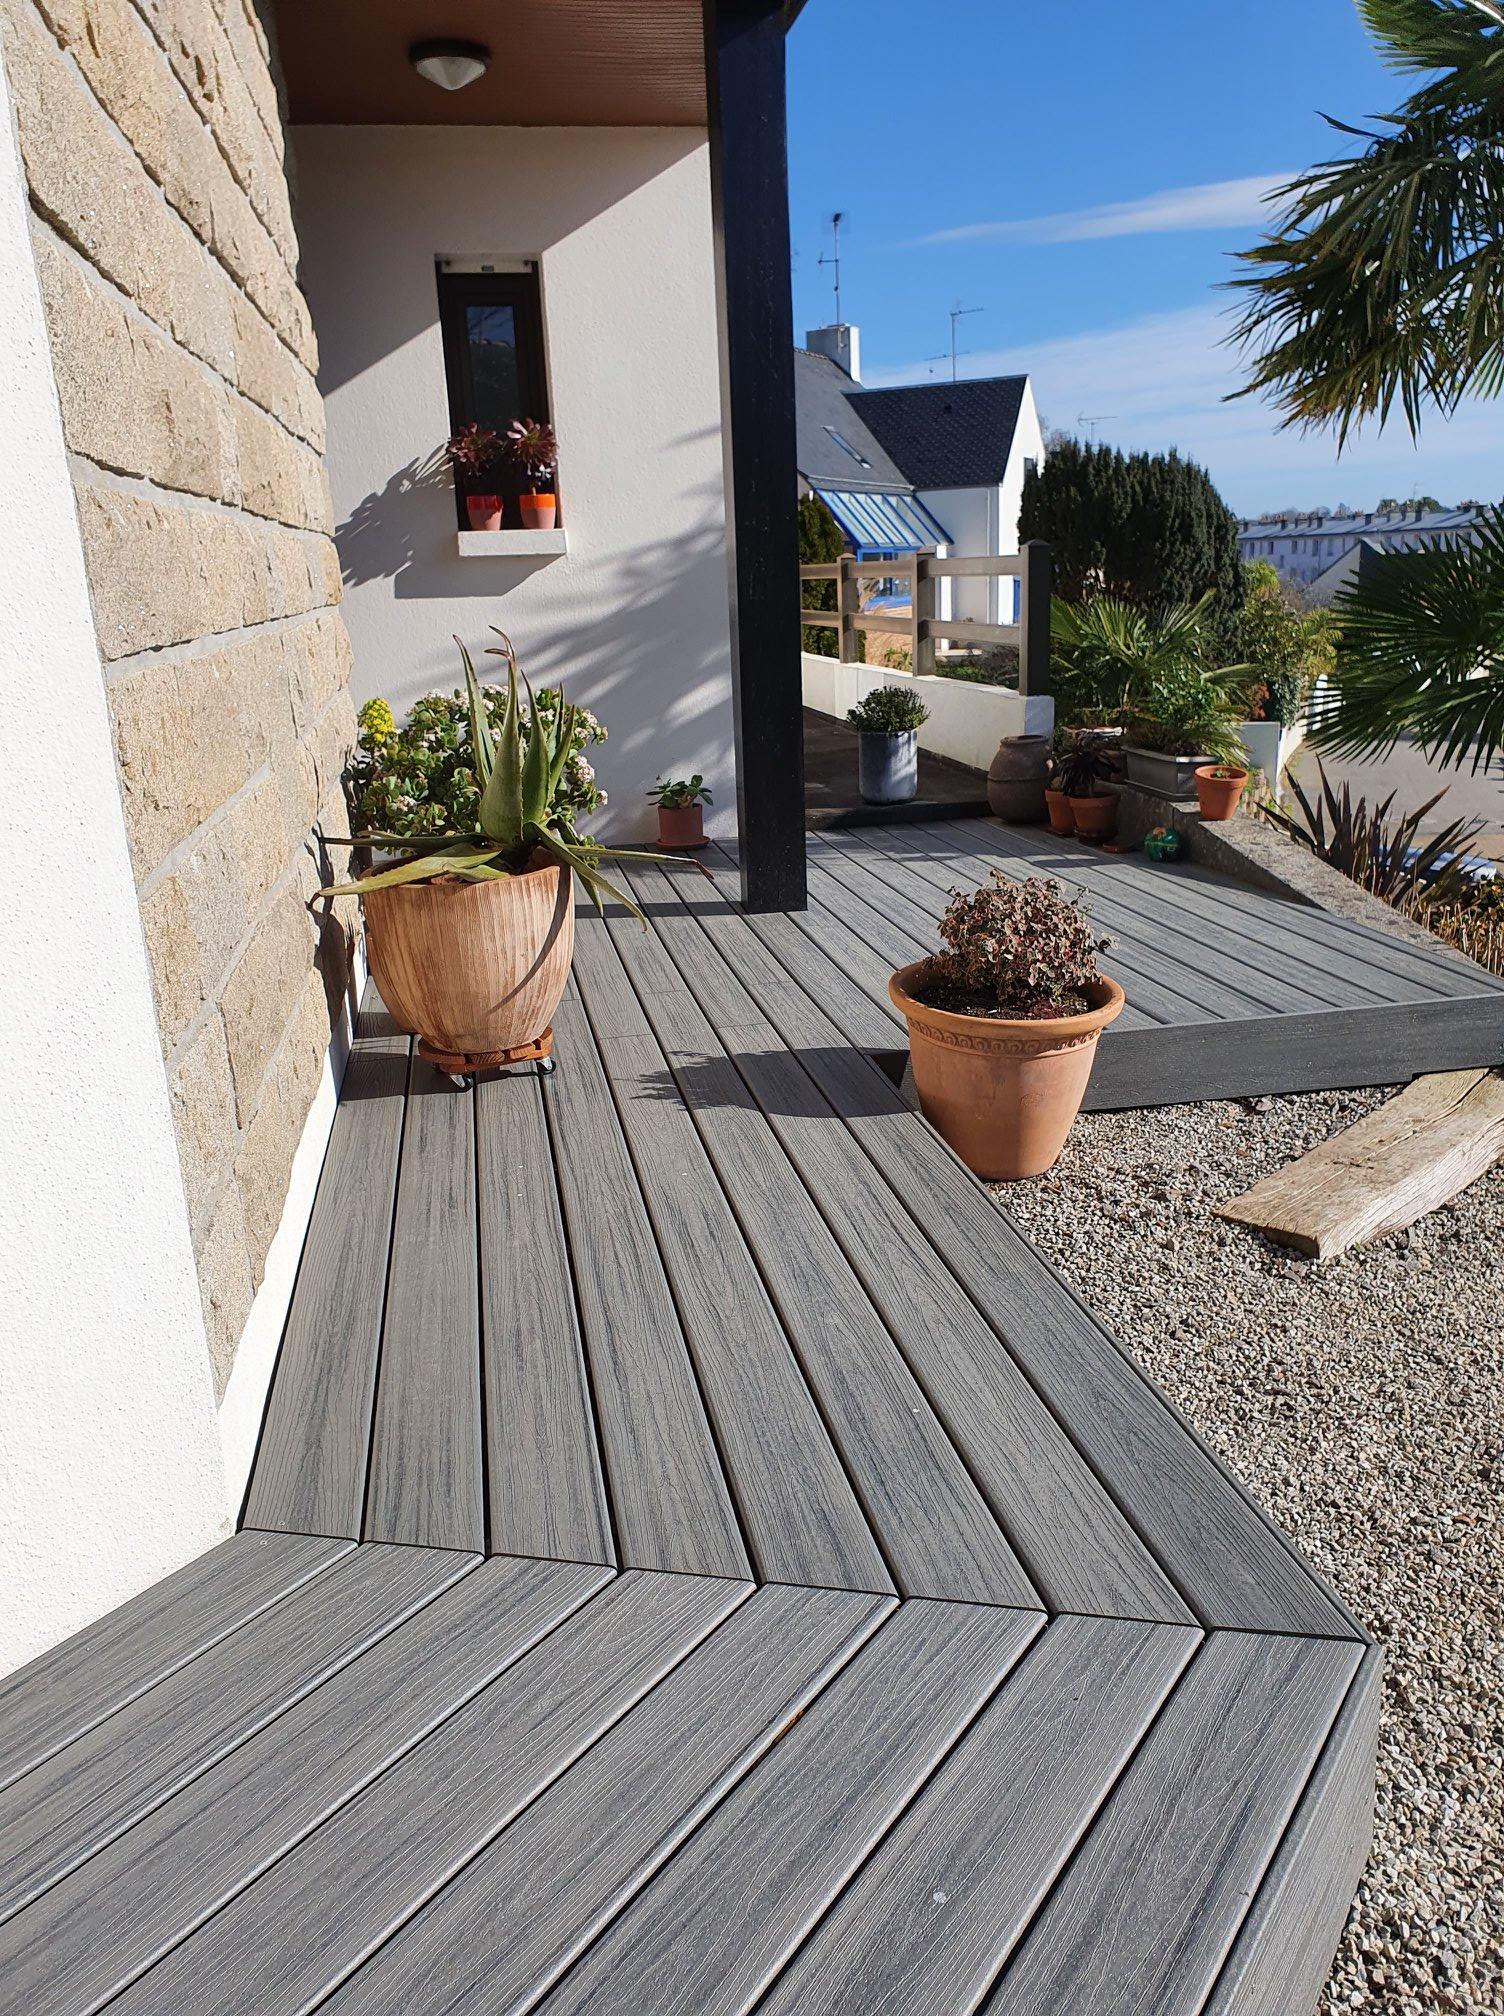 1626335829 116 Realisation dune terrasse en composite TREX de co - Réalisation d'une terrasse en composite TREX de co...